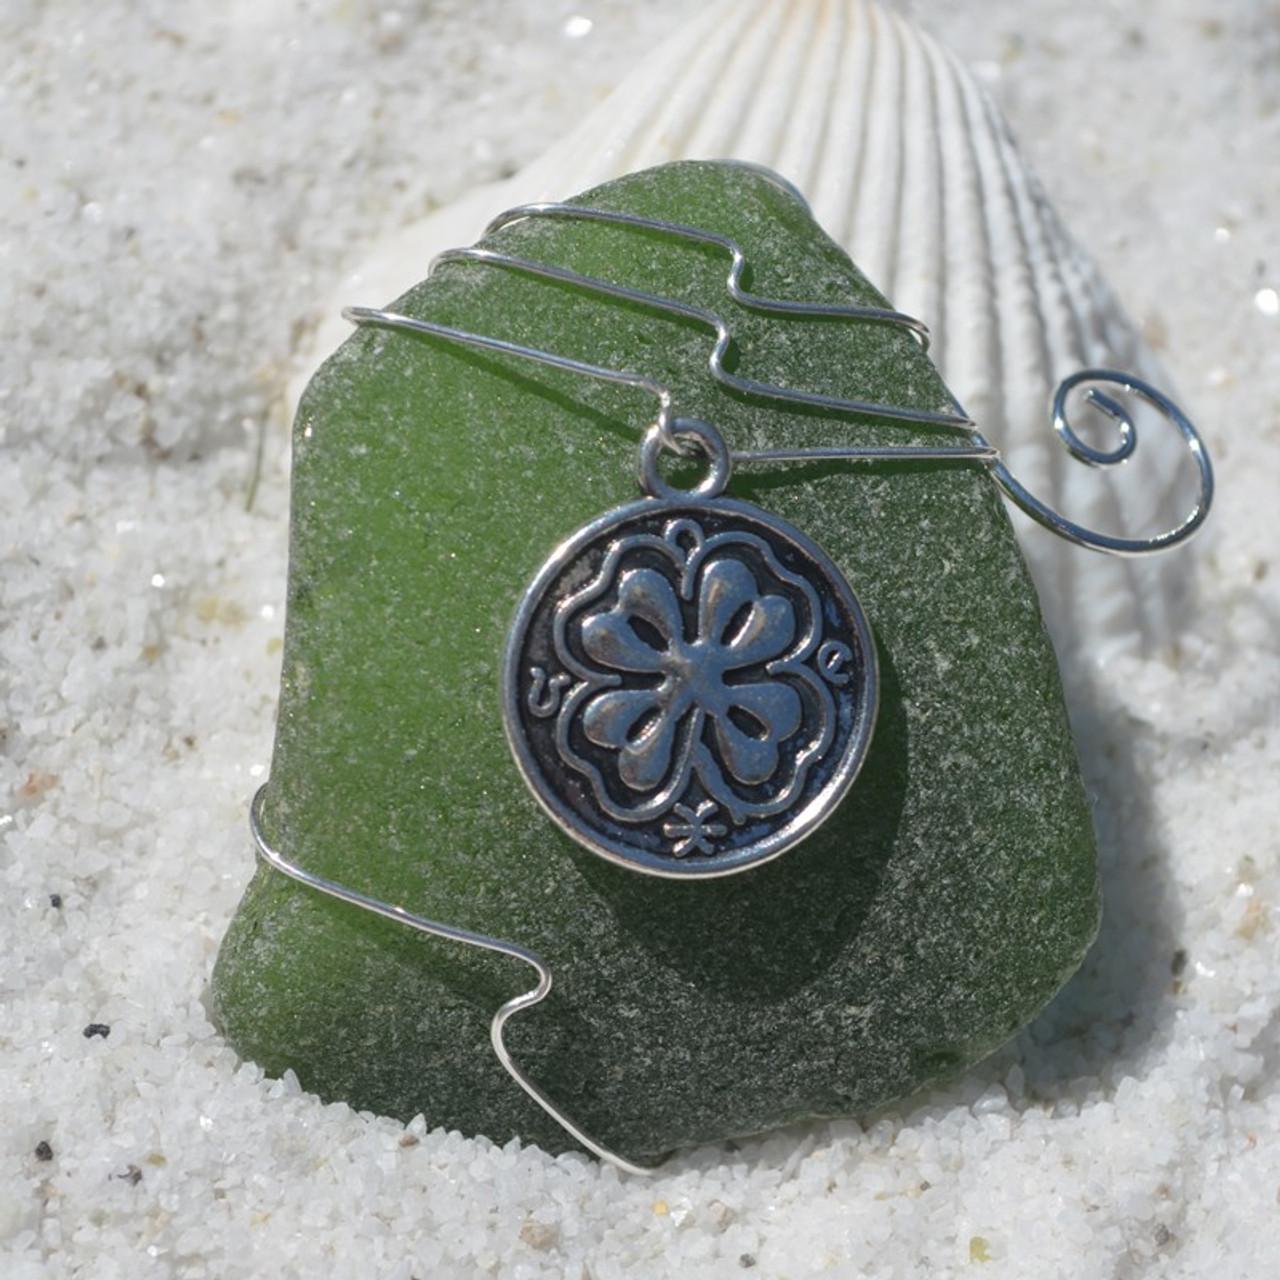 Clover Ornament